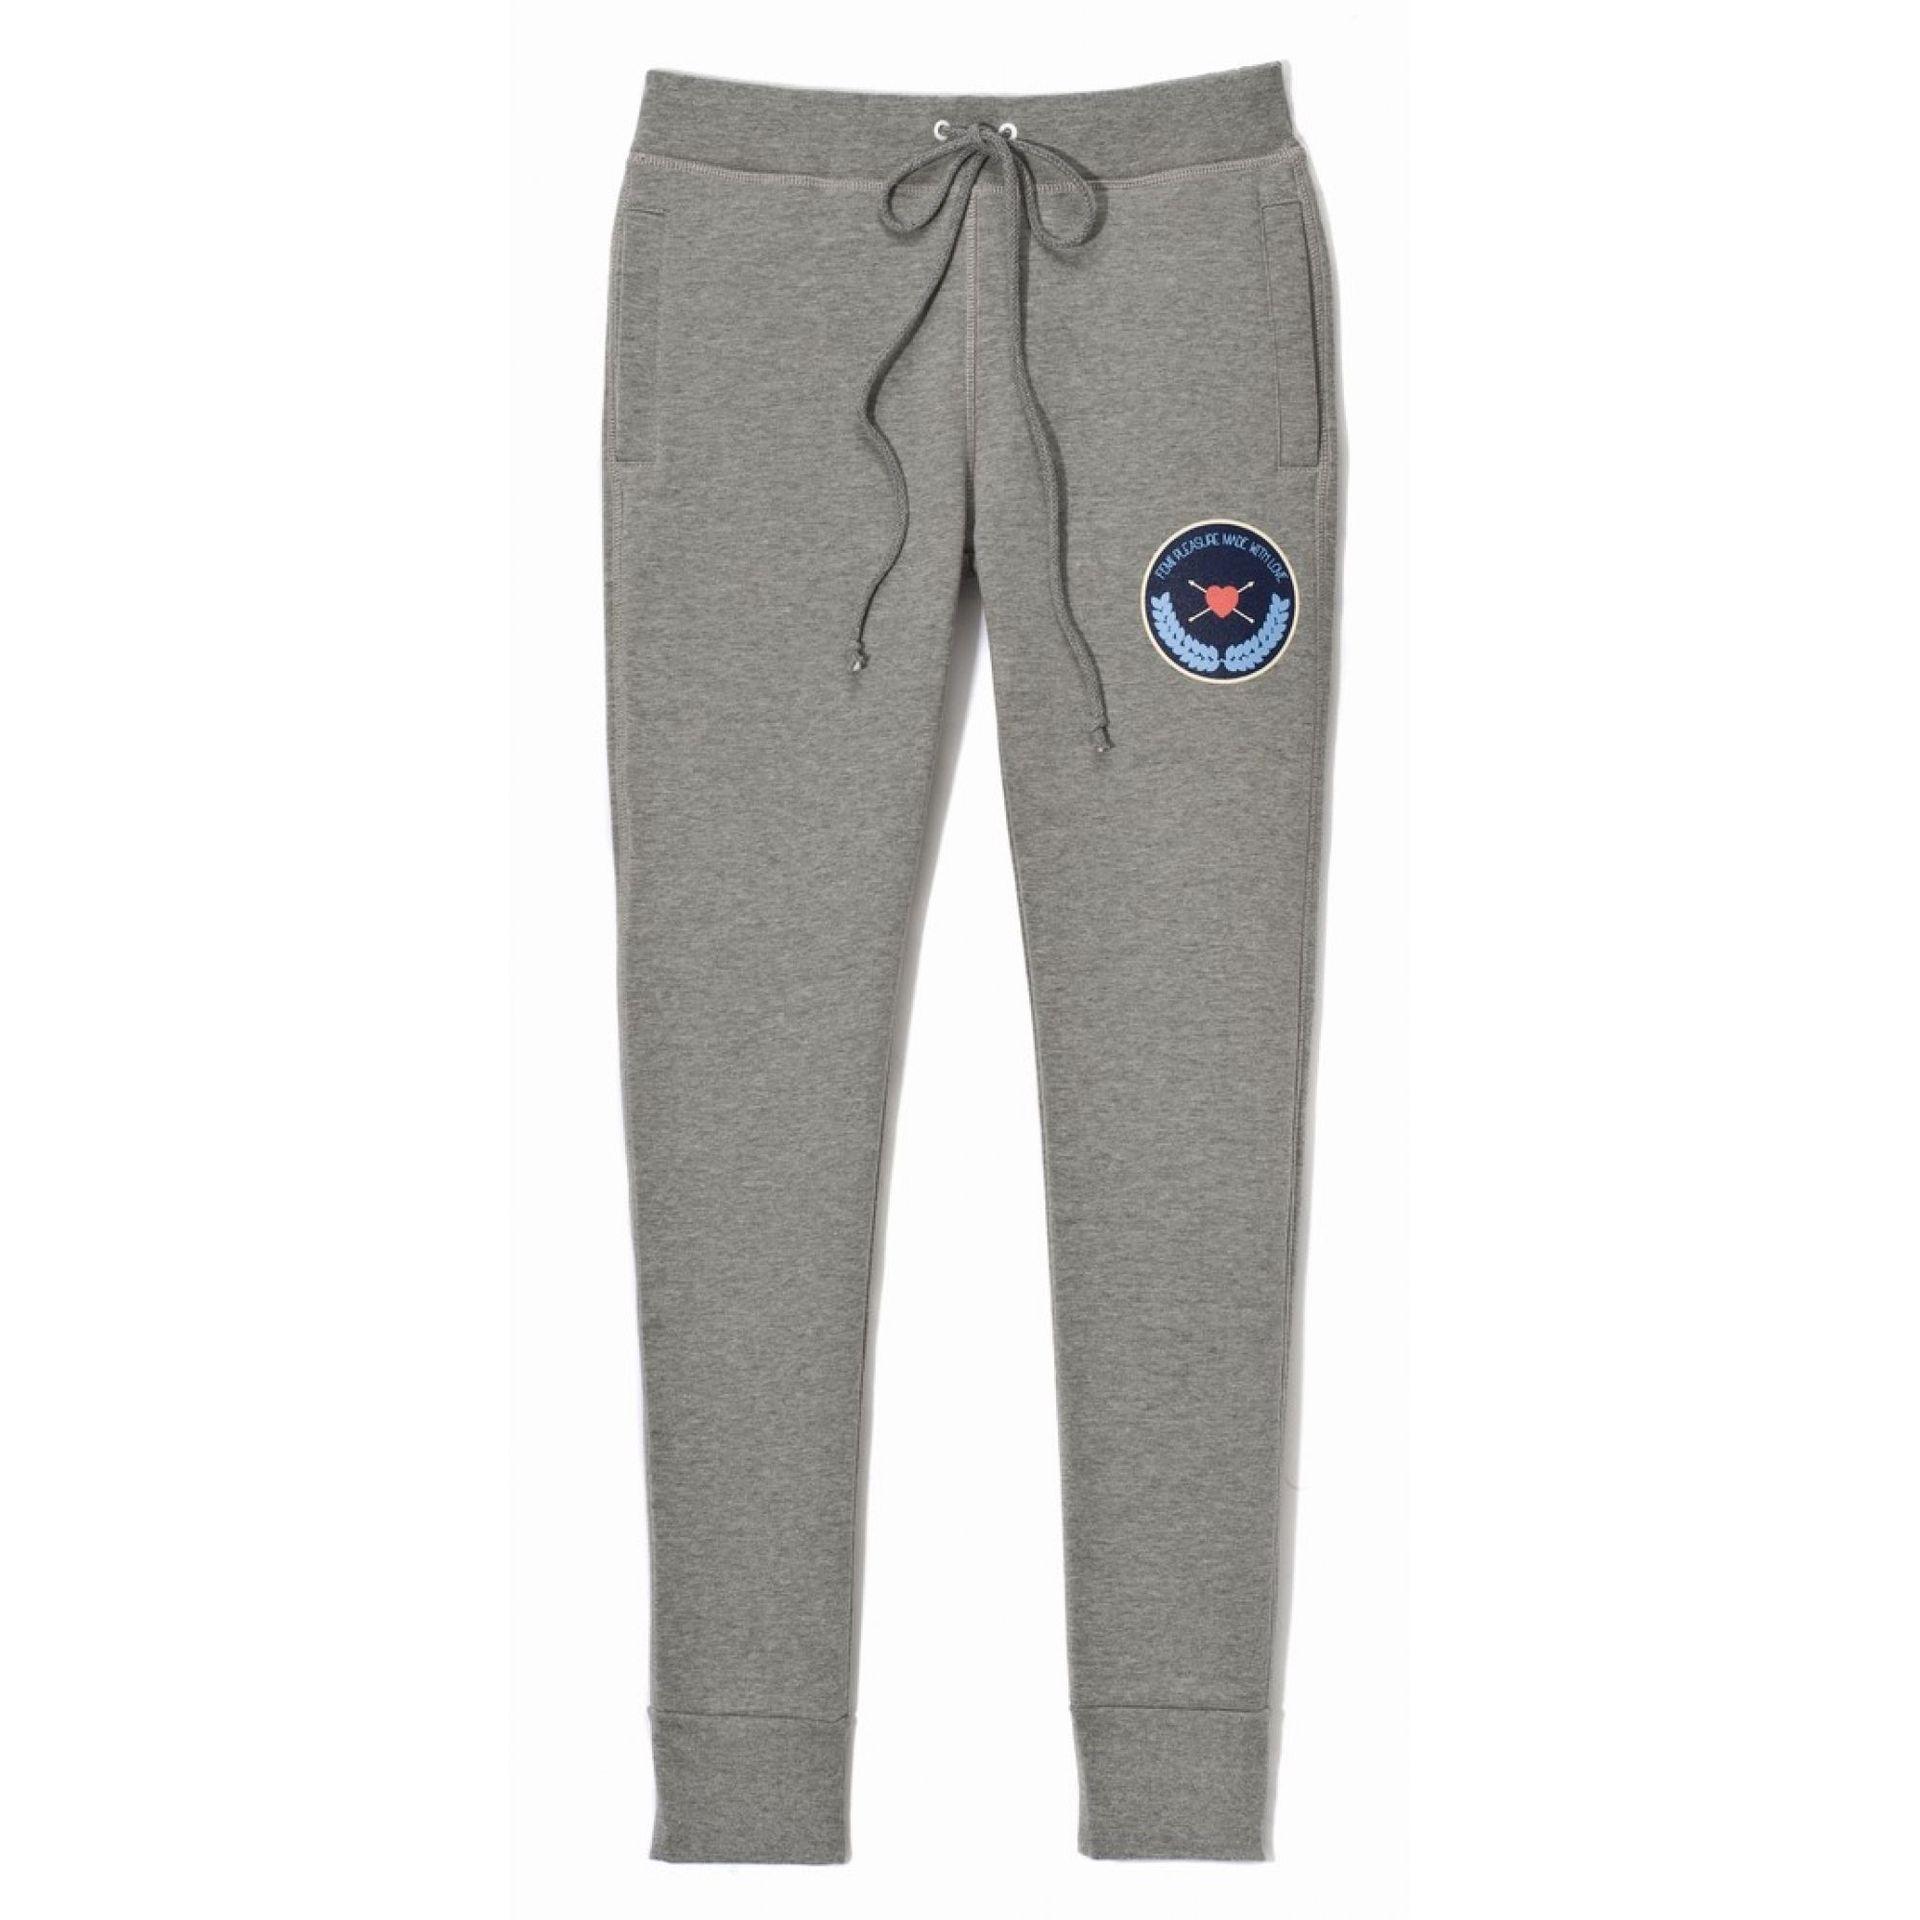 Spodnie Femipleasure Point szare